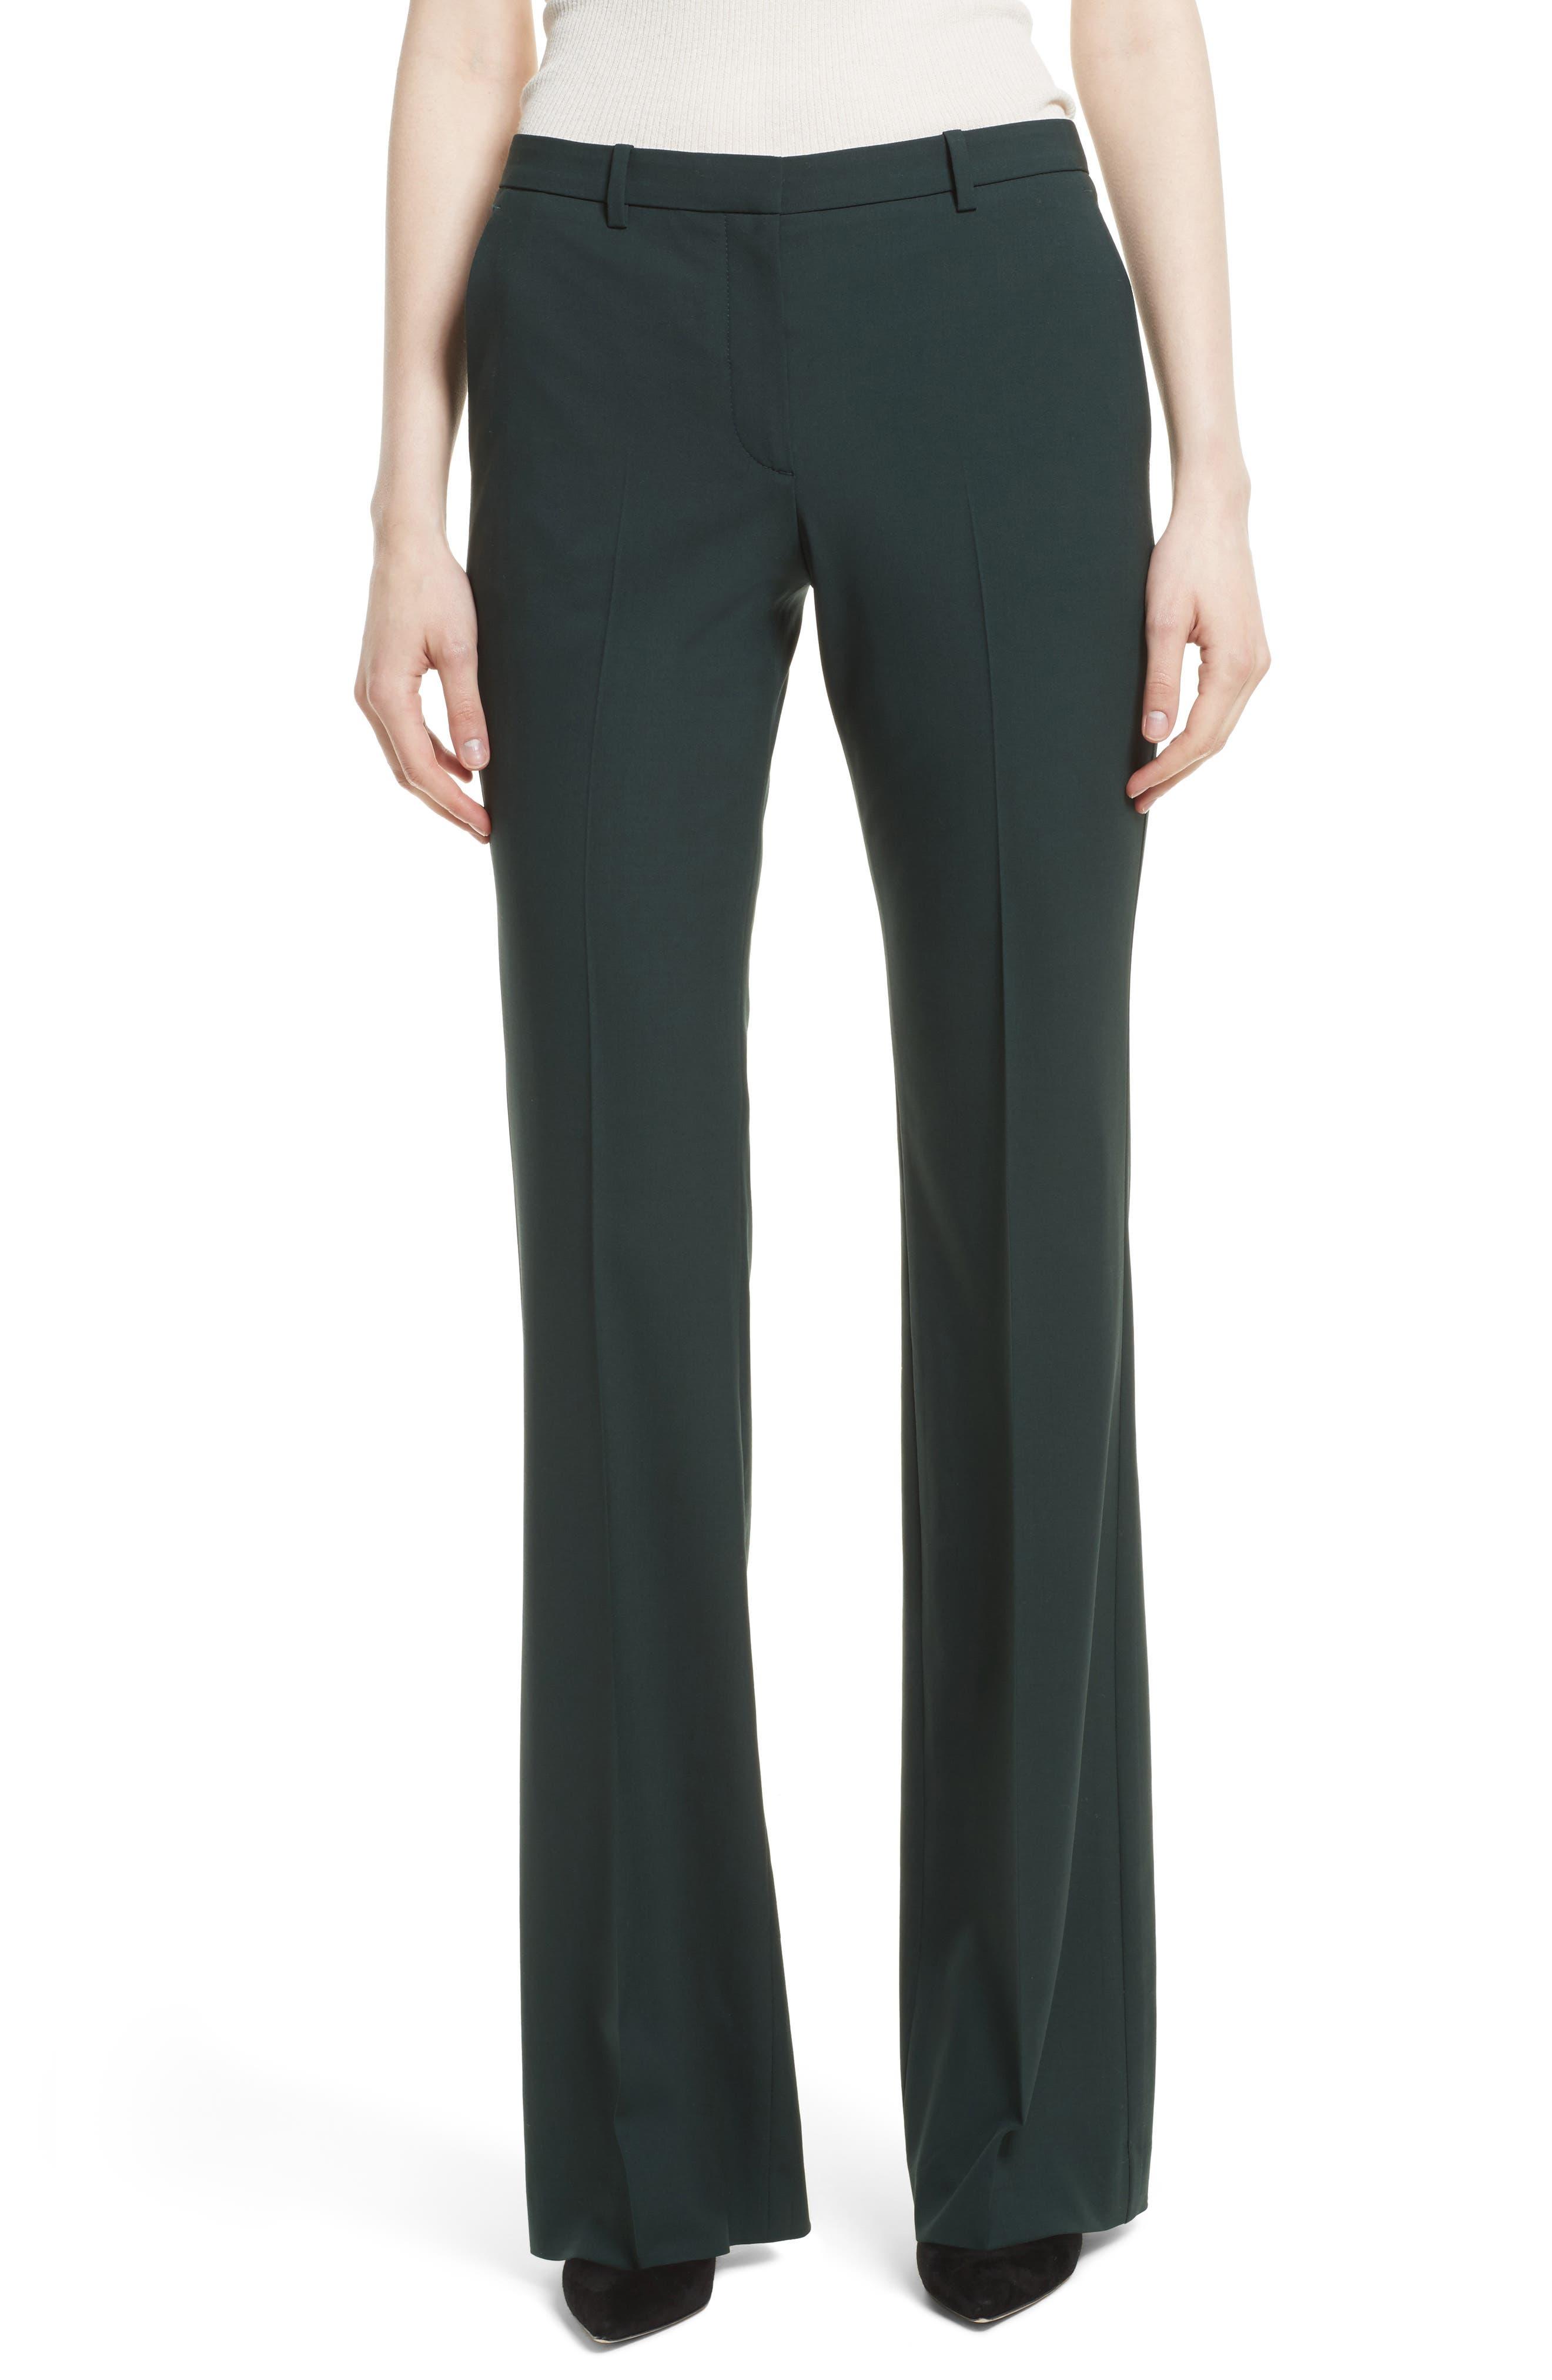 Demitria 2 Flare Leg Stretch Wool Pants,                         Main,                         color, Dark Billiard